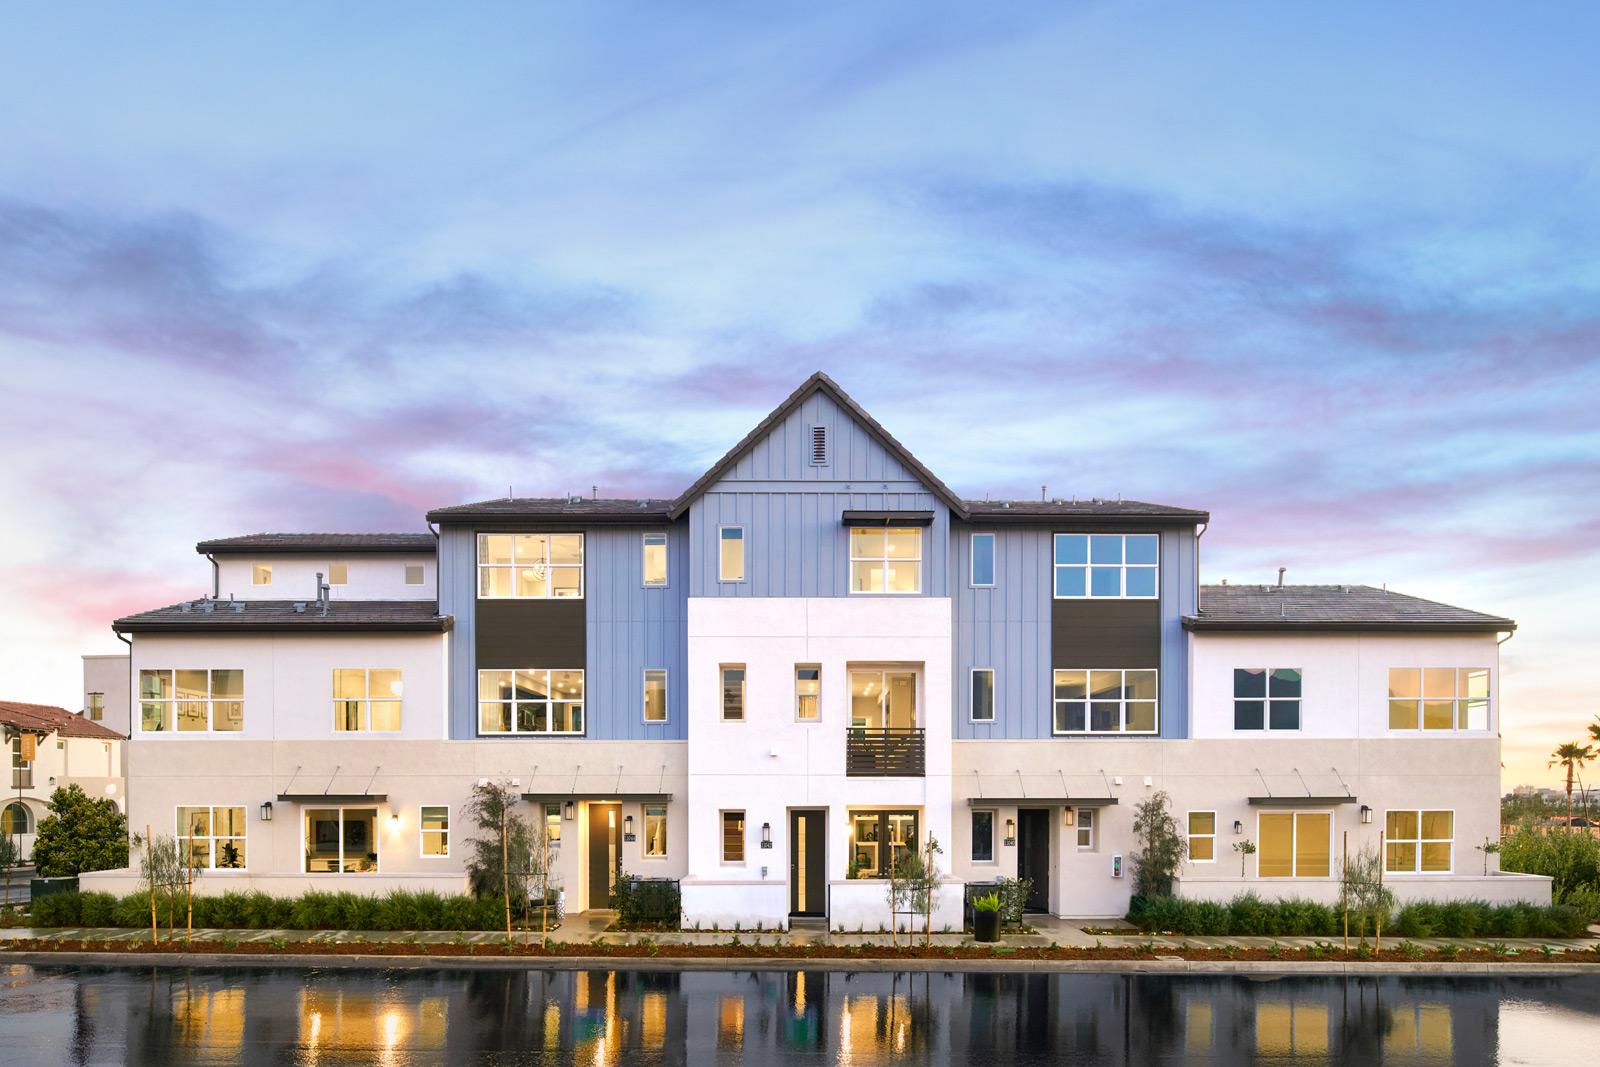 Exterior   Enliven   New Homes in Rancho Cucamonga, CA   Van Daele Homes